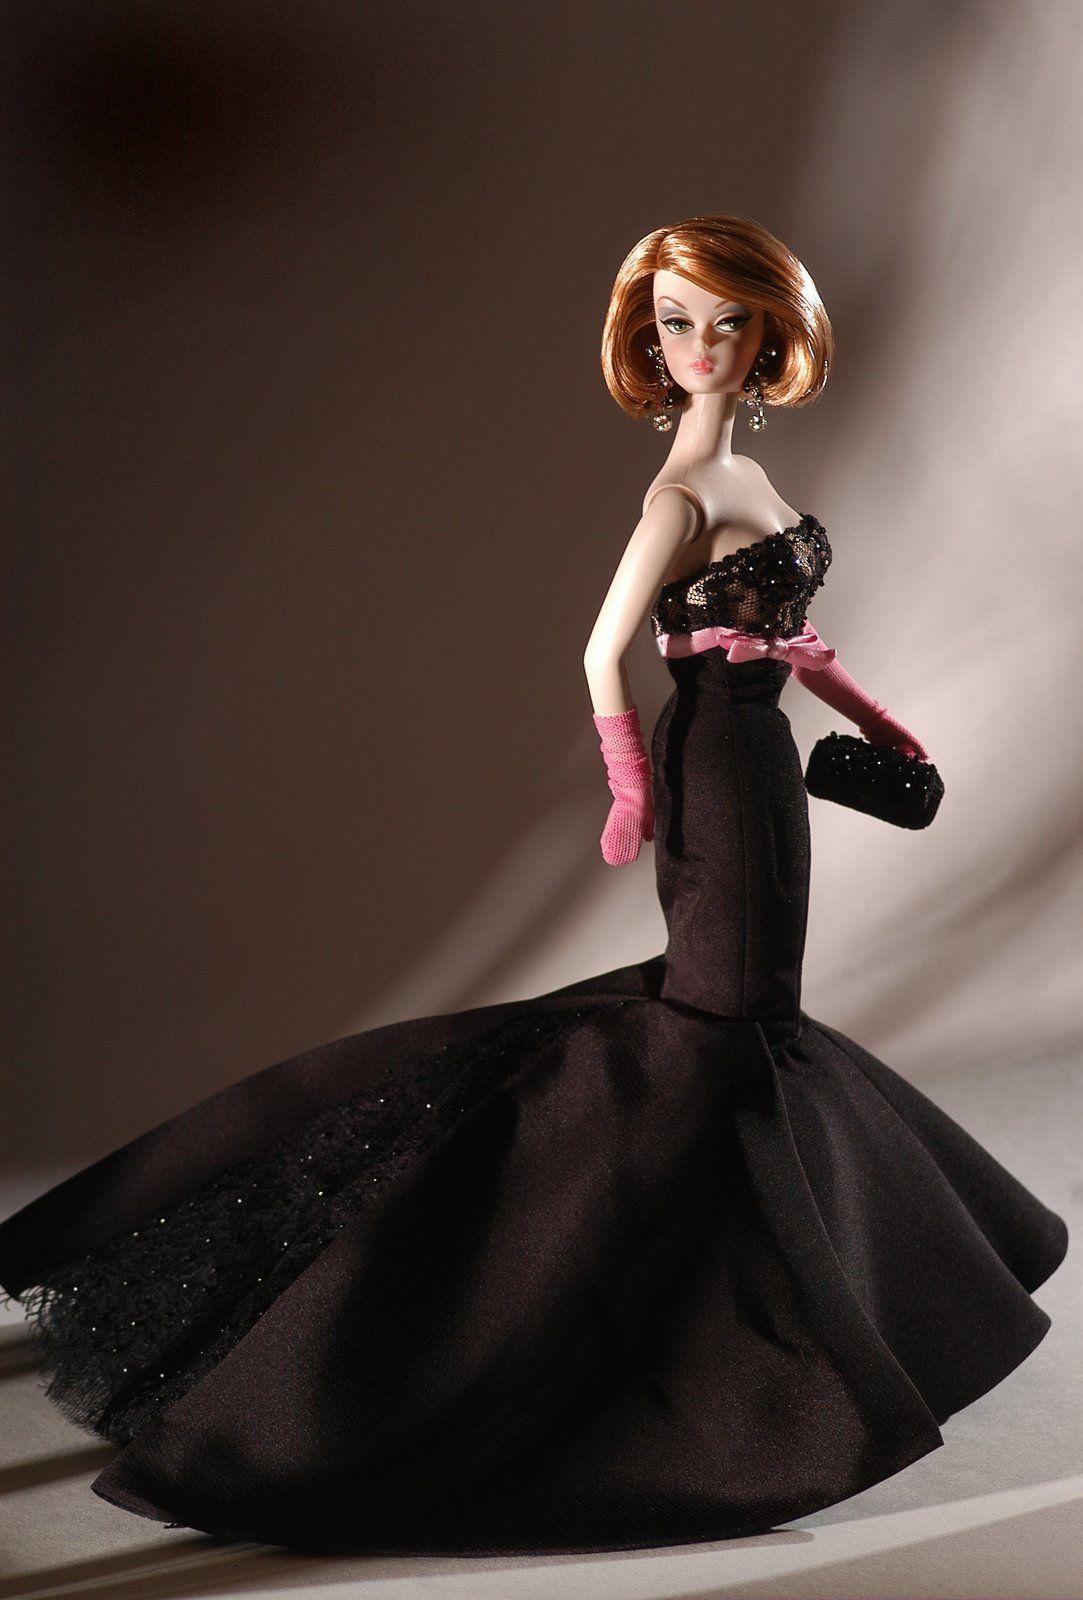 Barbie in Black dress